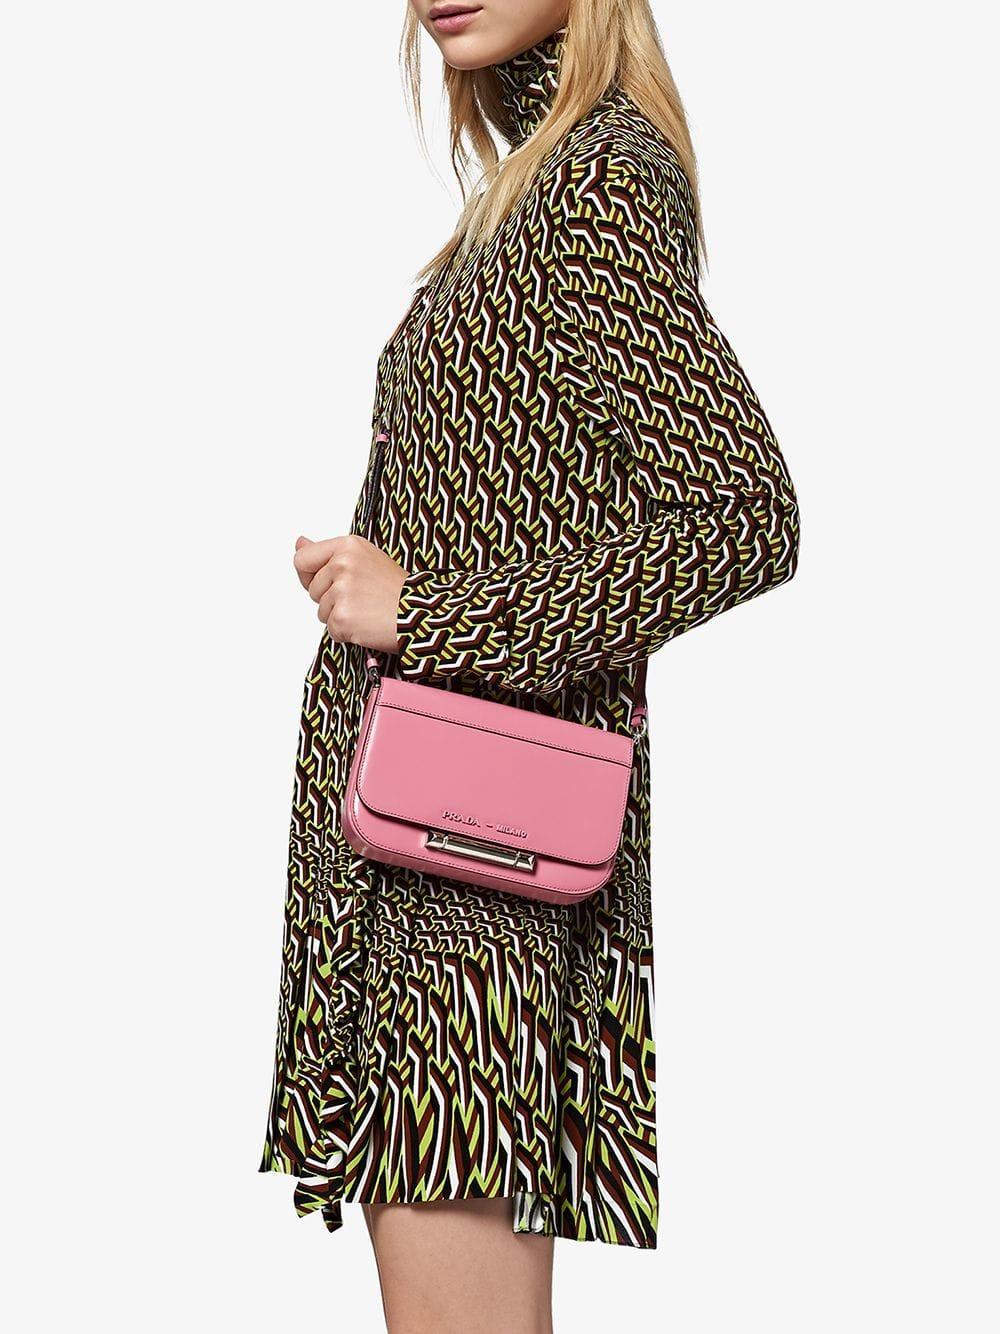 30f6f000d33d Prada - Pink Sybille Leather Shoulder Bag - Lyst. View fullscreen